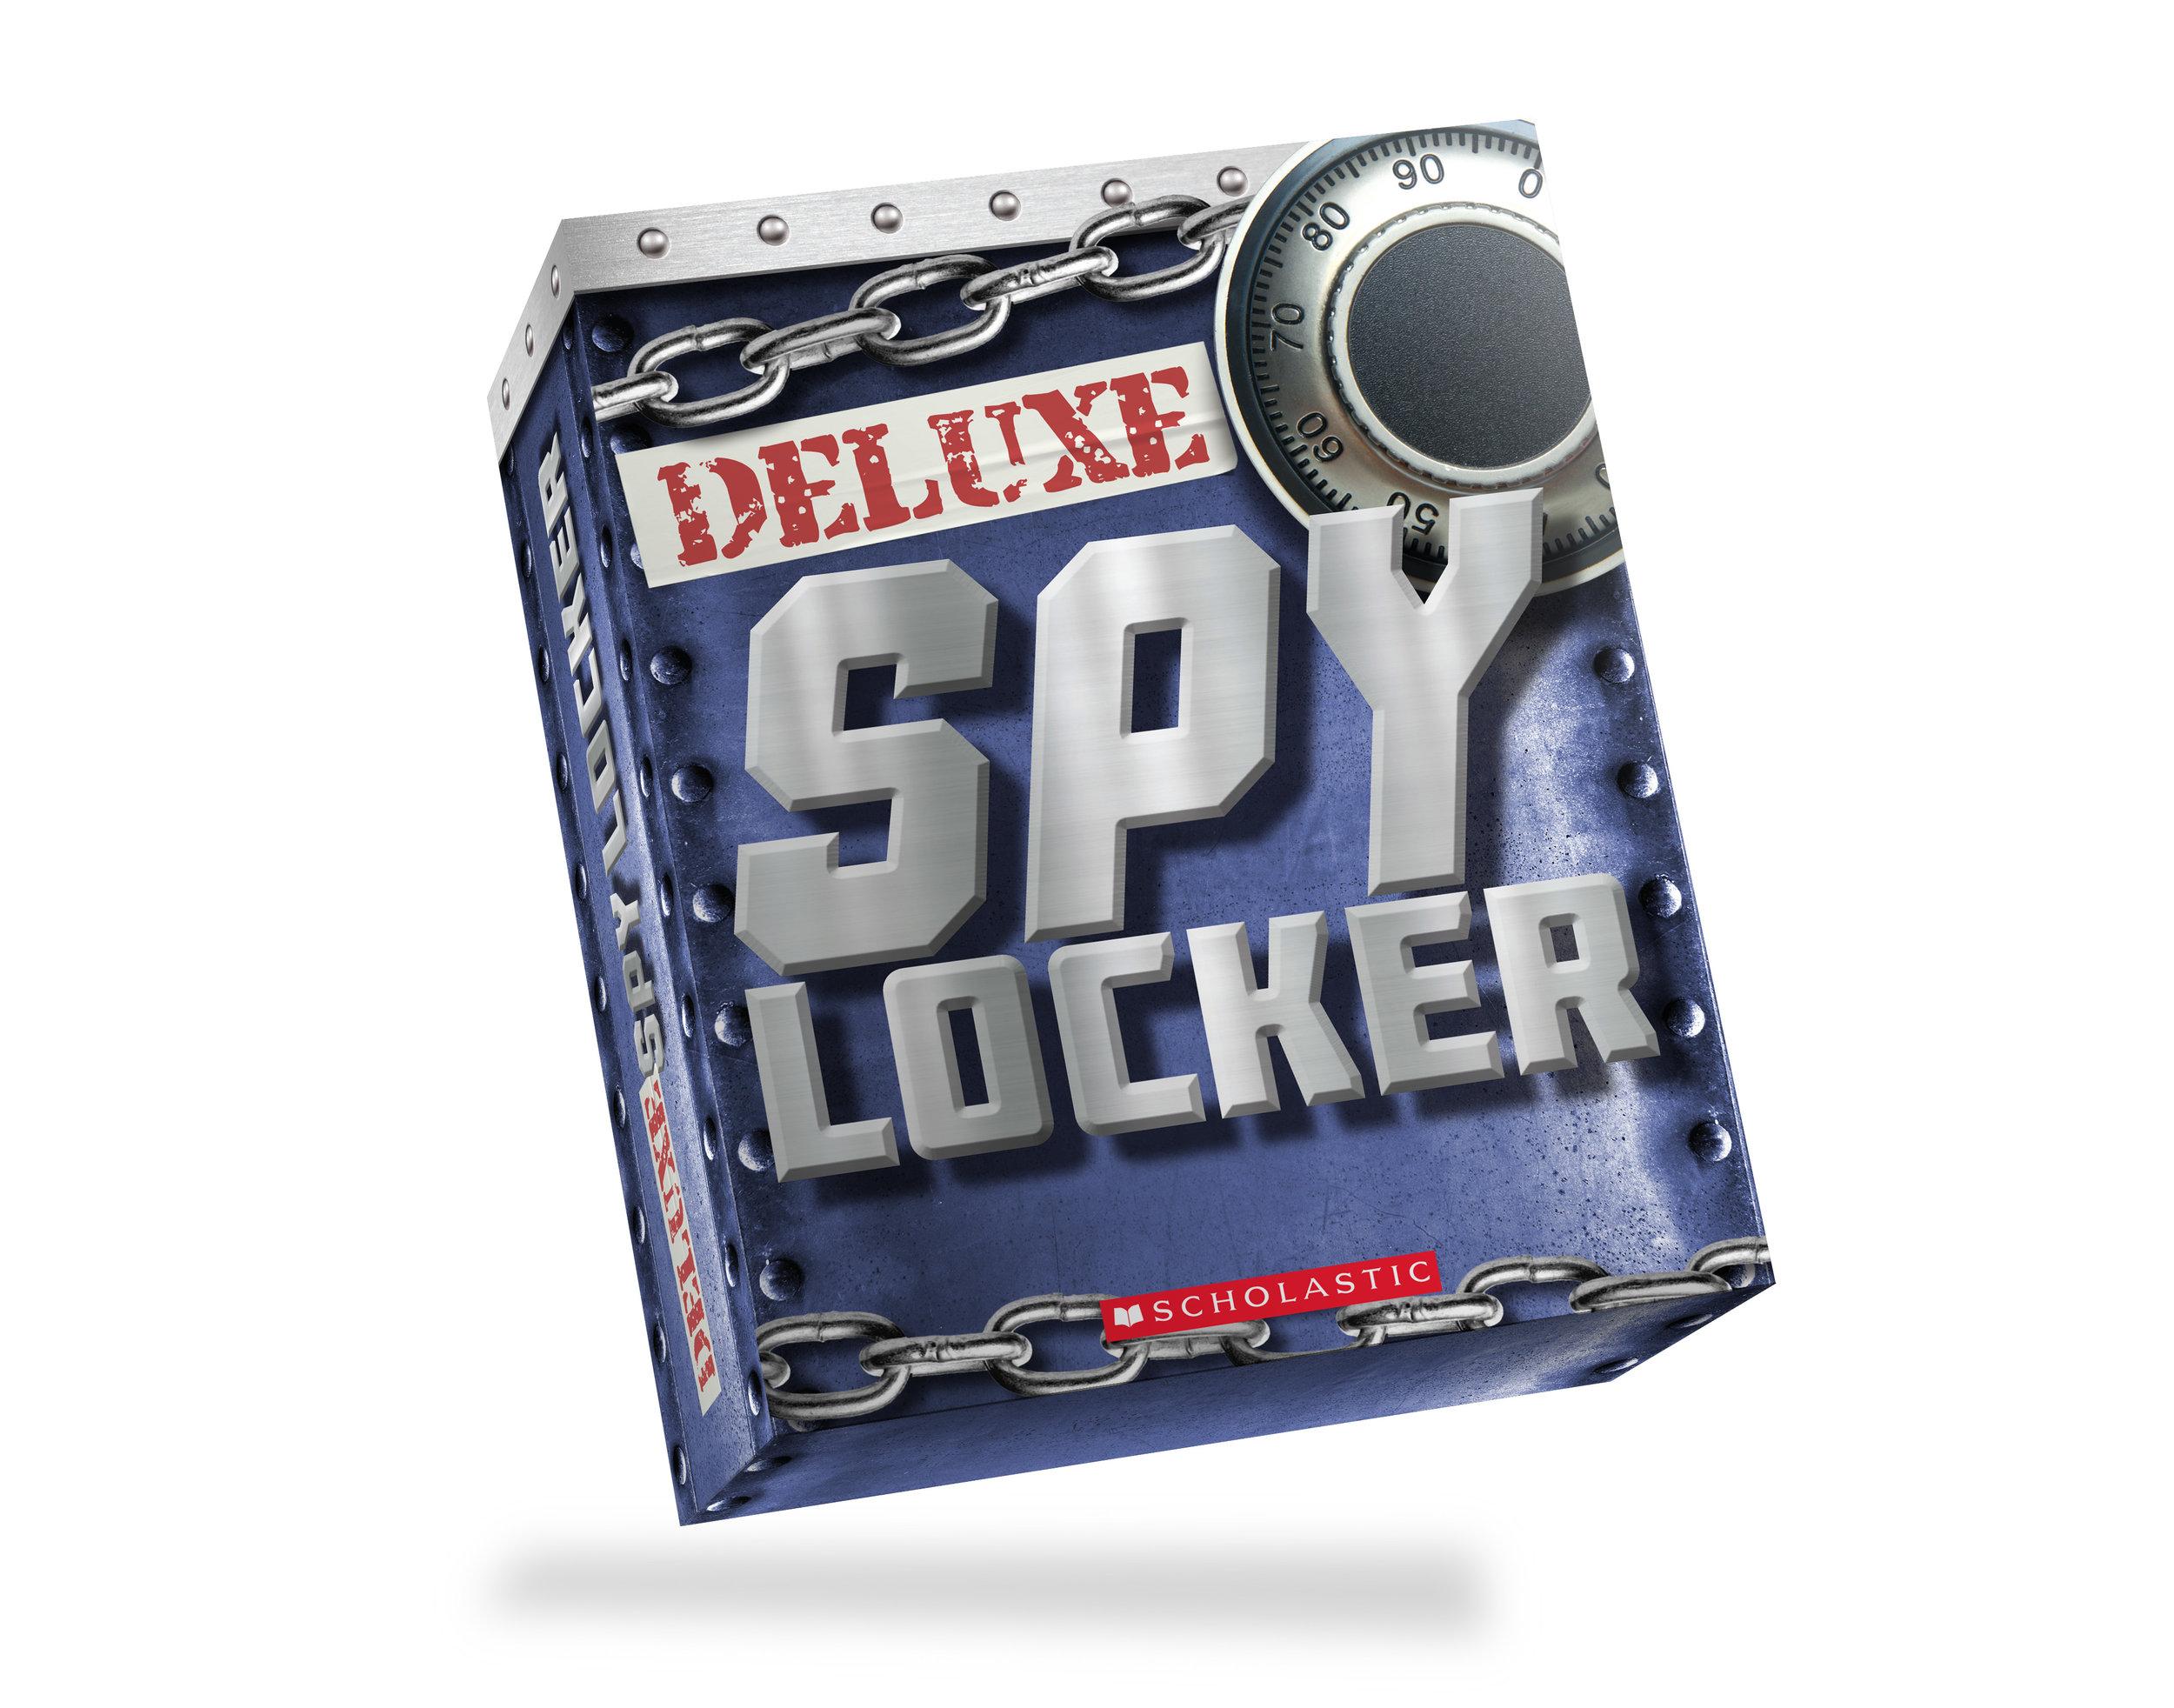 spy locker 3D front.jpg